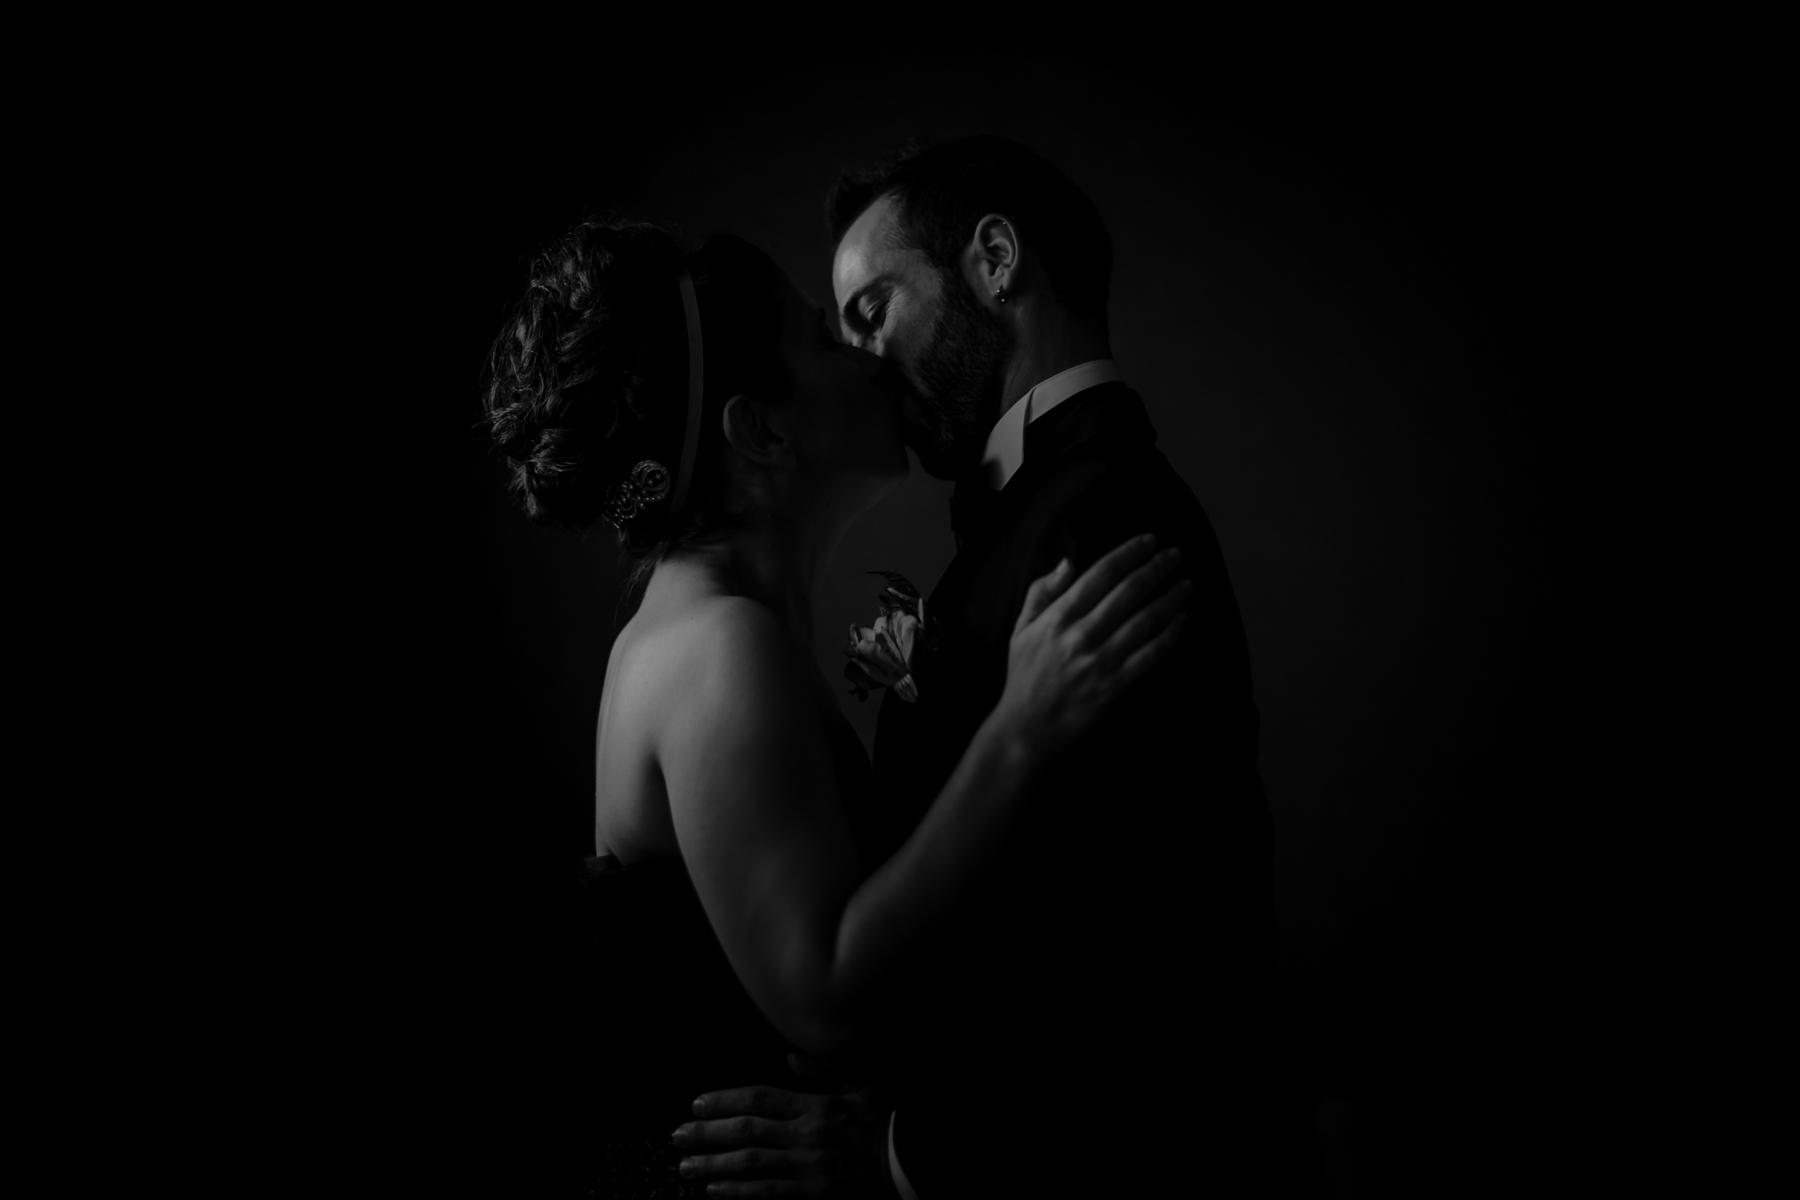 fotografo de bodas Jairo Crena-57